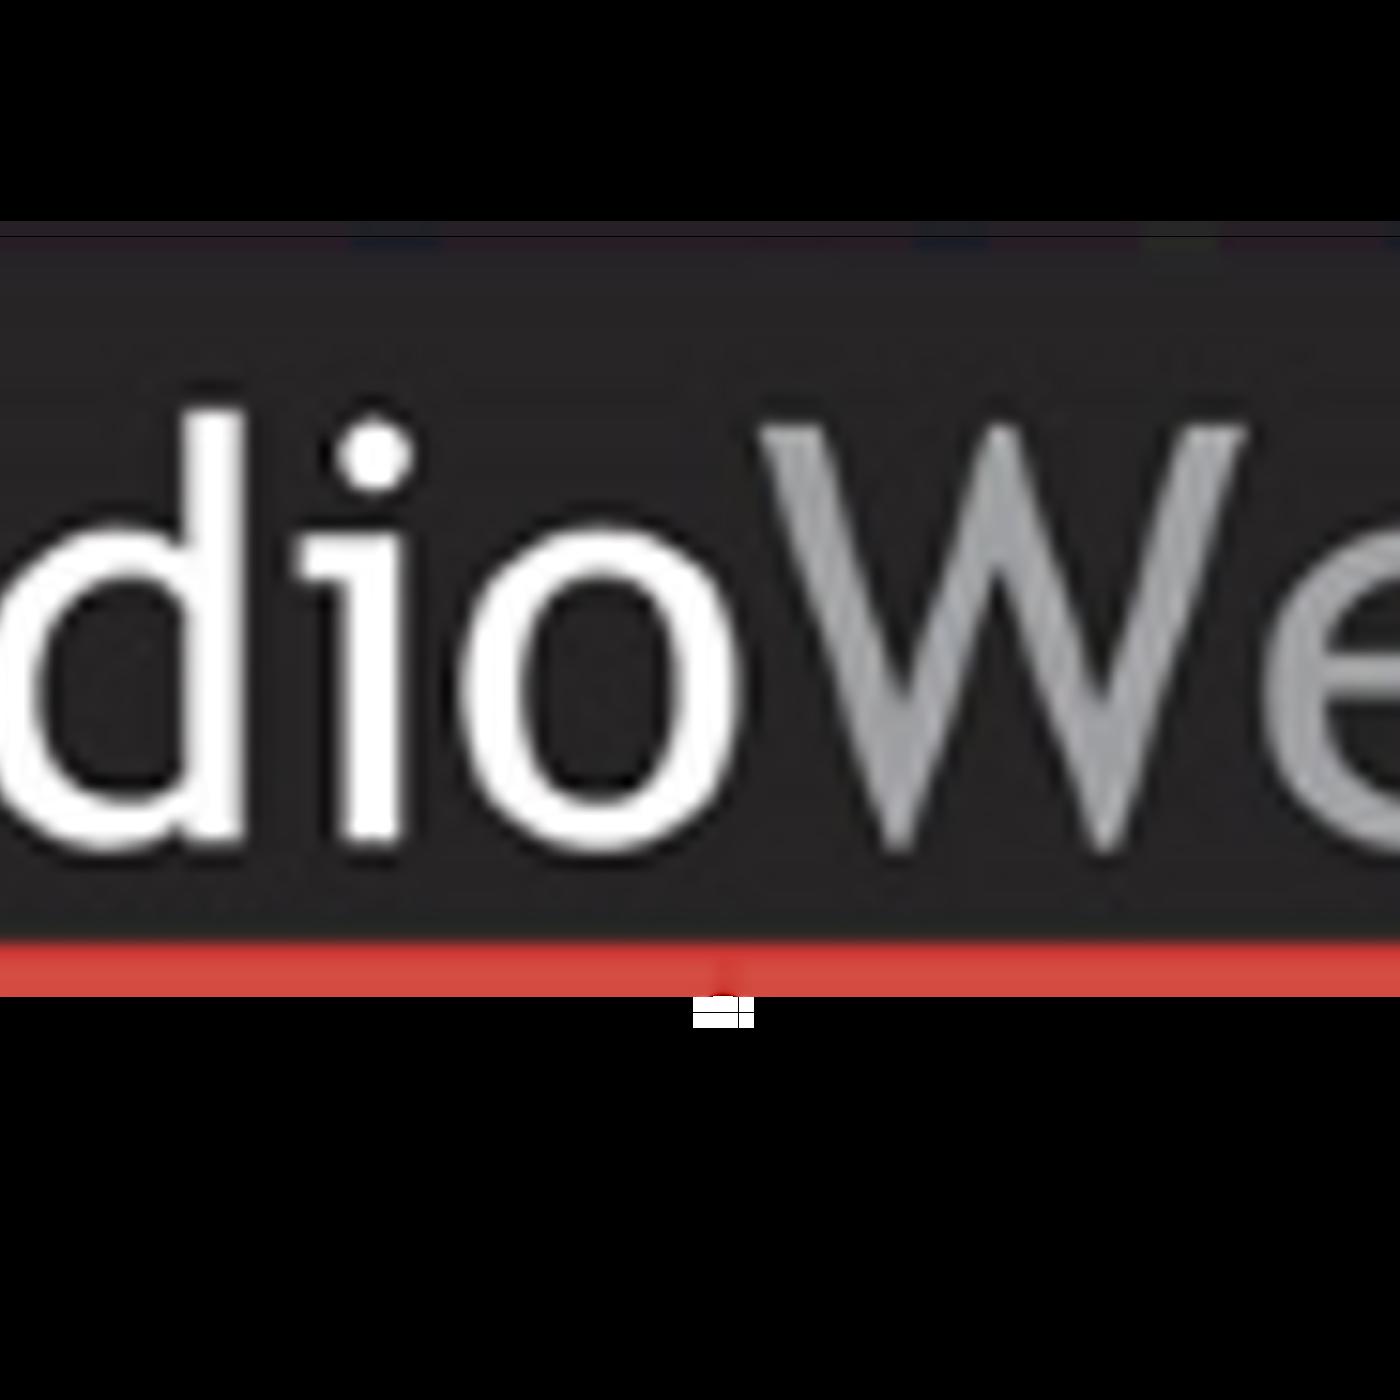 Dh50j1crtwwlrer0lulg radiowest new